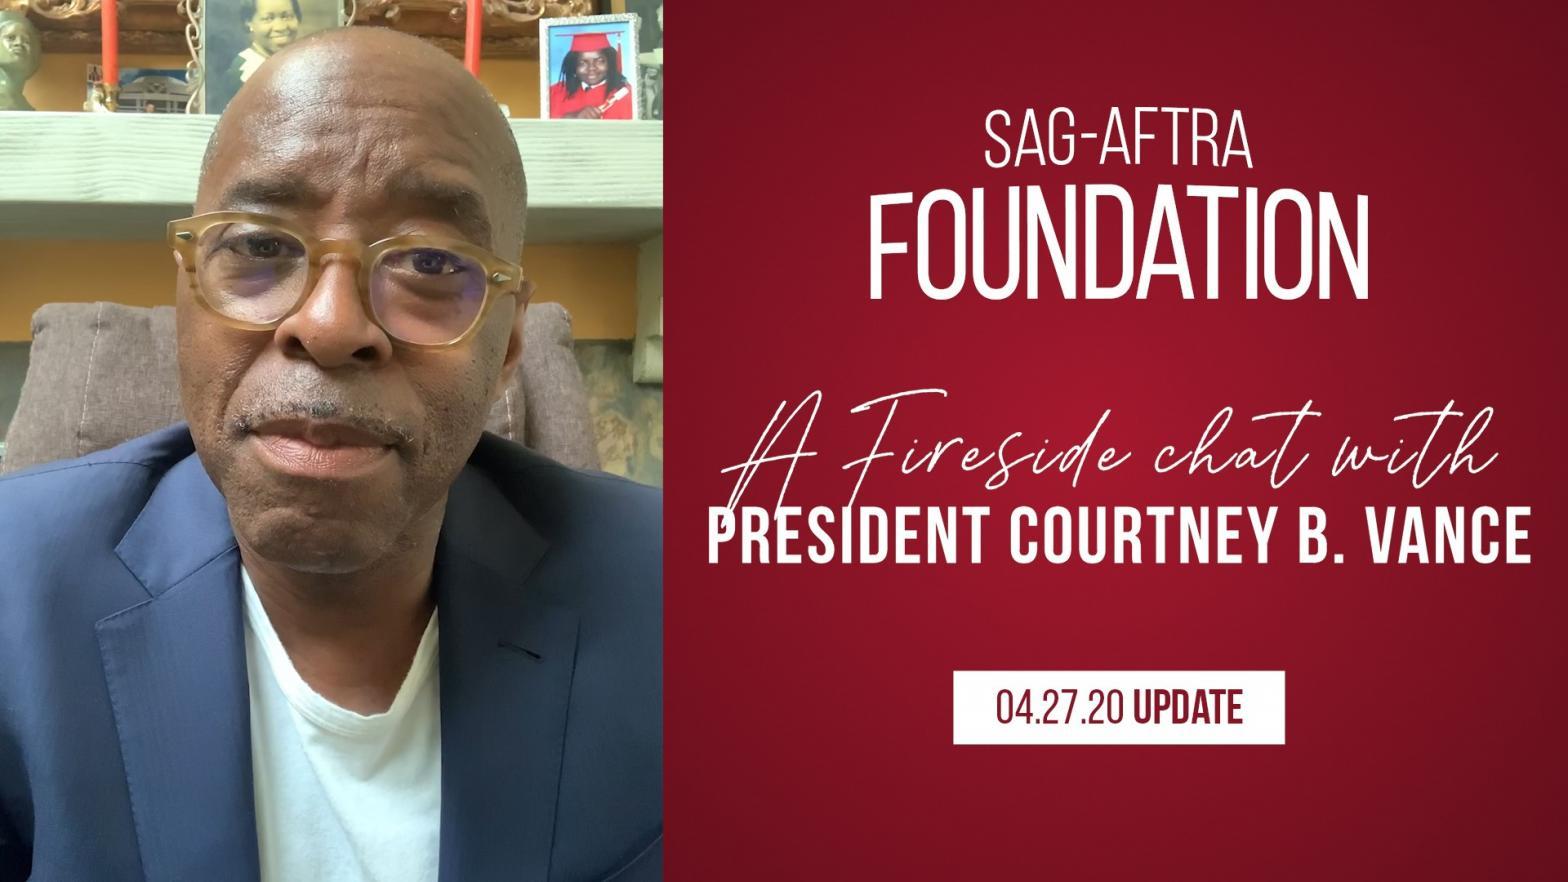 SAG-AFTRA Foundation President, Courtney B Vance